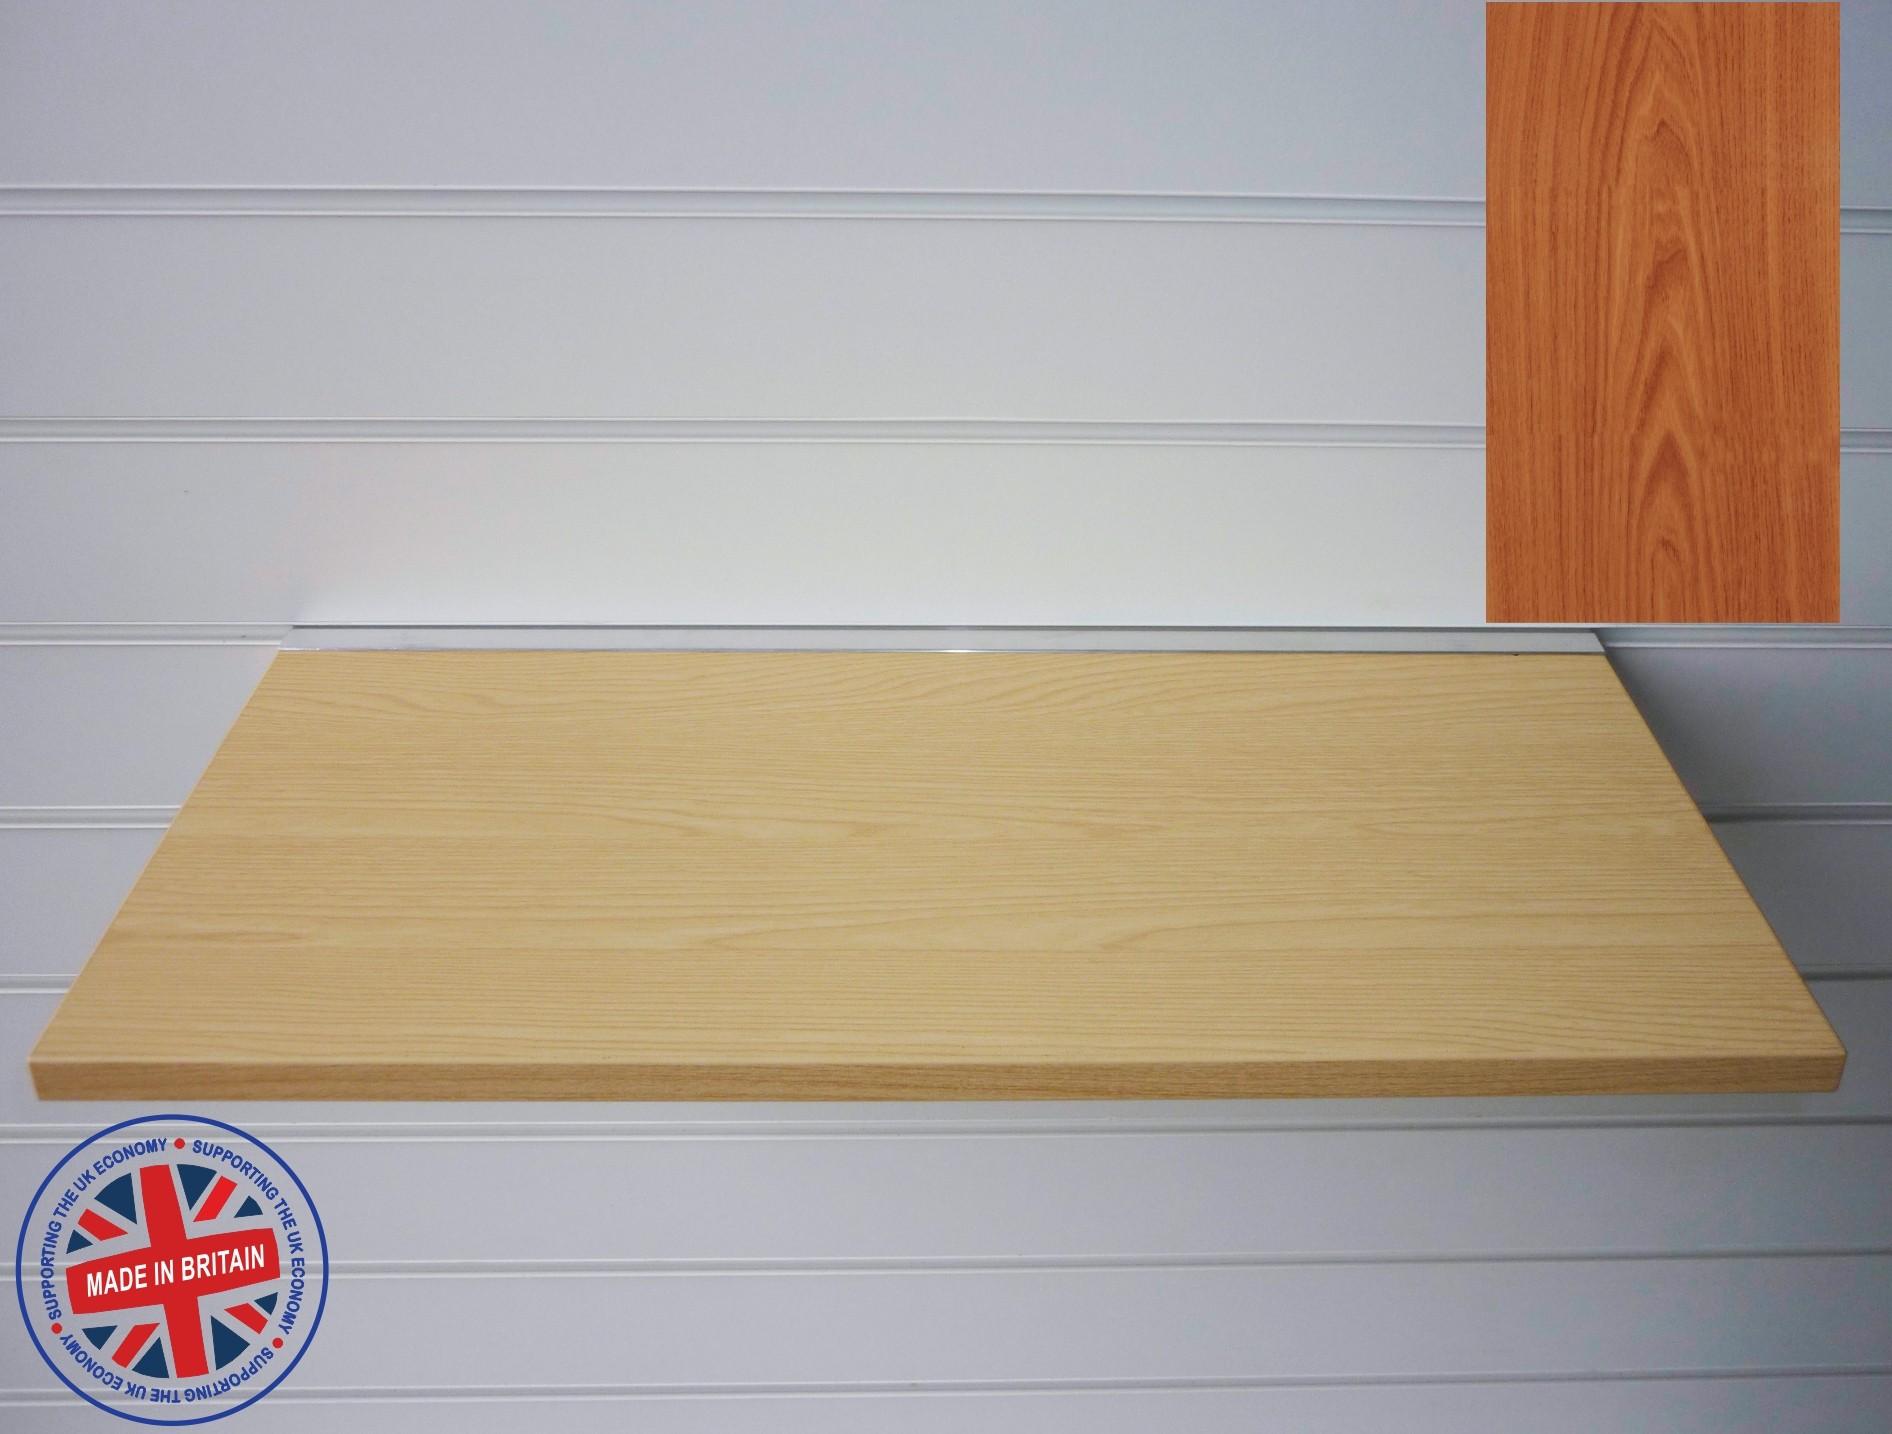 cherry wood shelf floating slatwall shelf 600mm wide x 400mm deep rh ukslatwallpanels co uk cherry wood shelving units cherry wood shelves individual